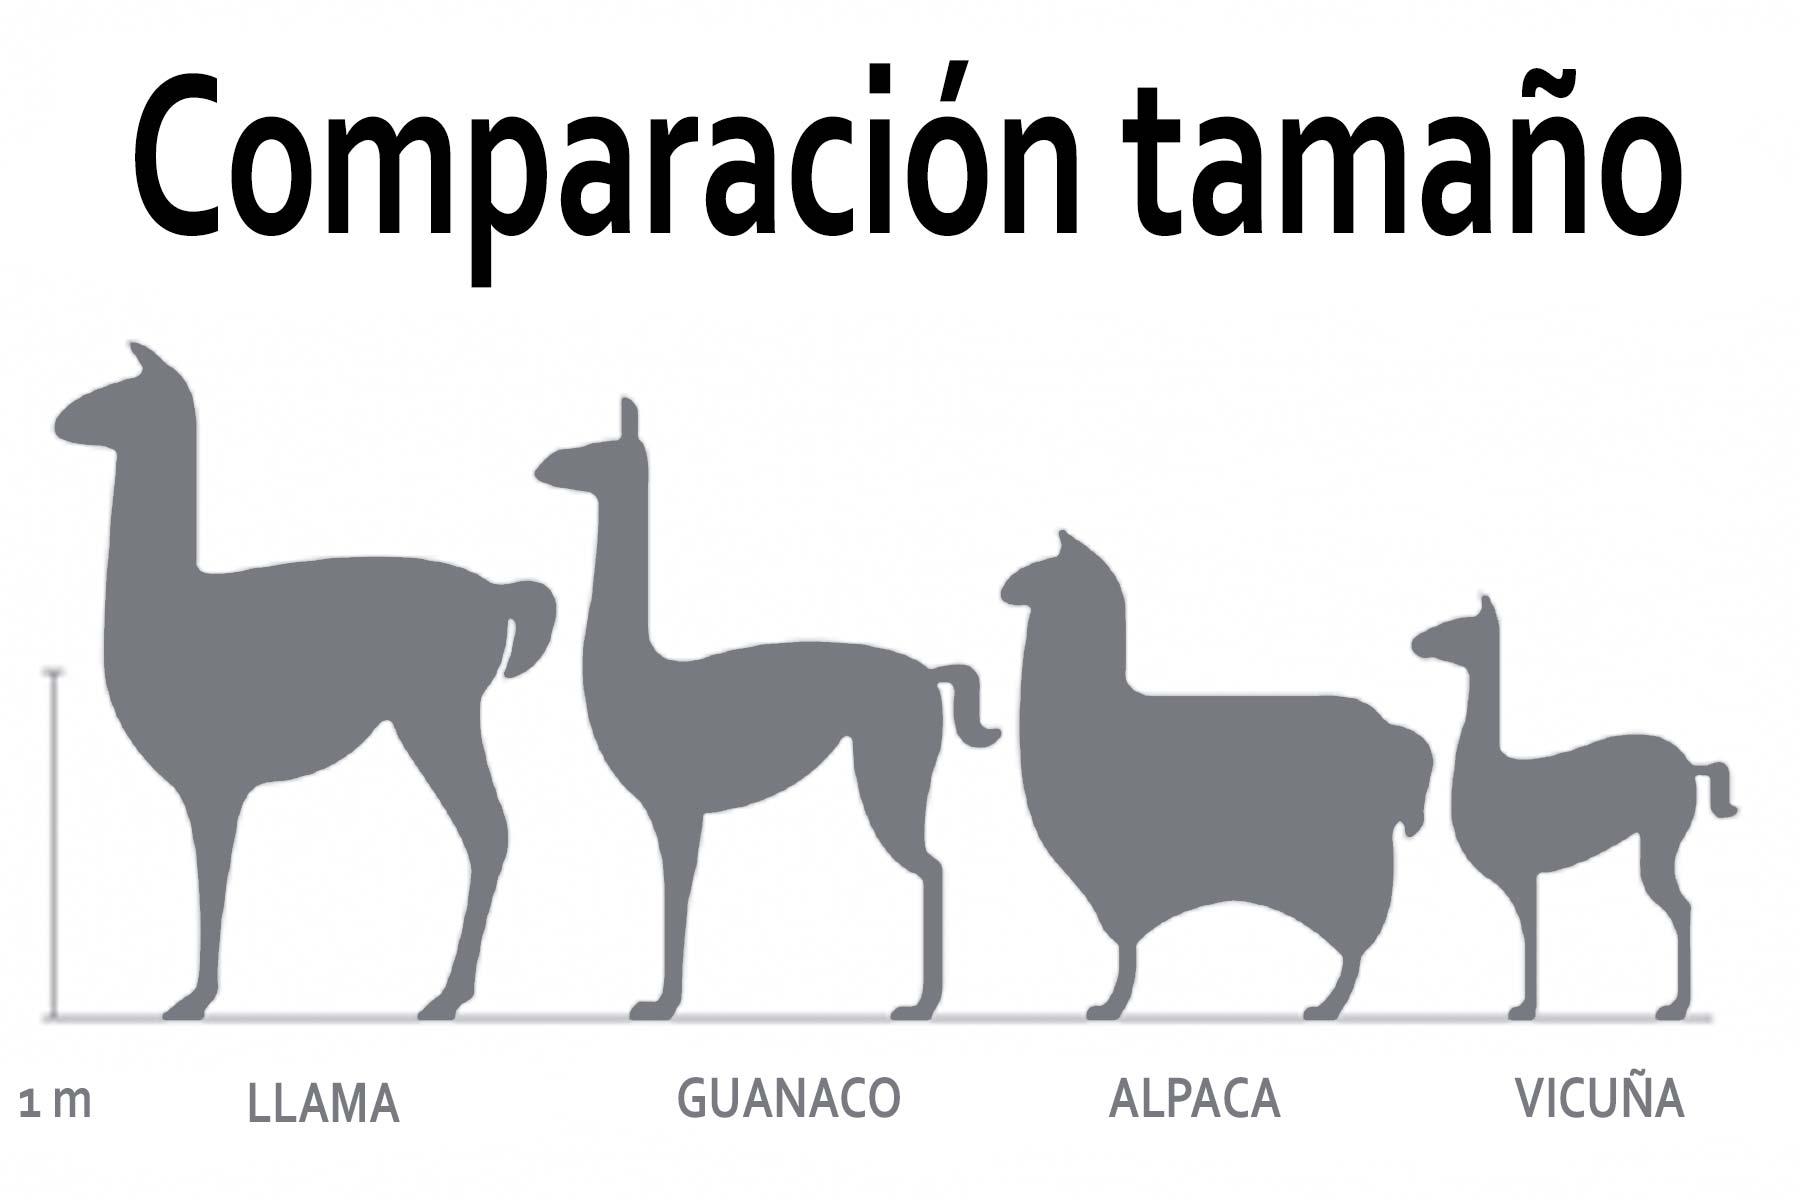 comparación tamaño de camelidos andinos